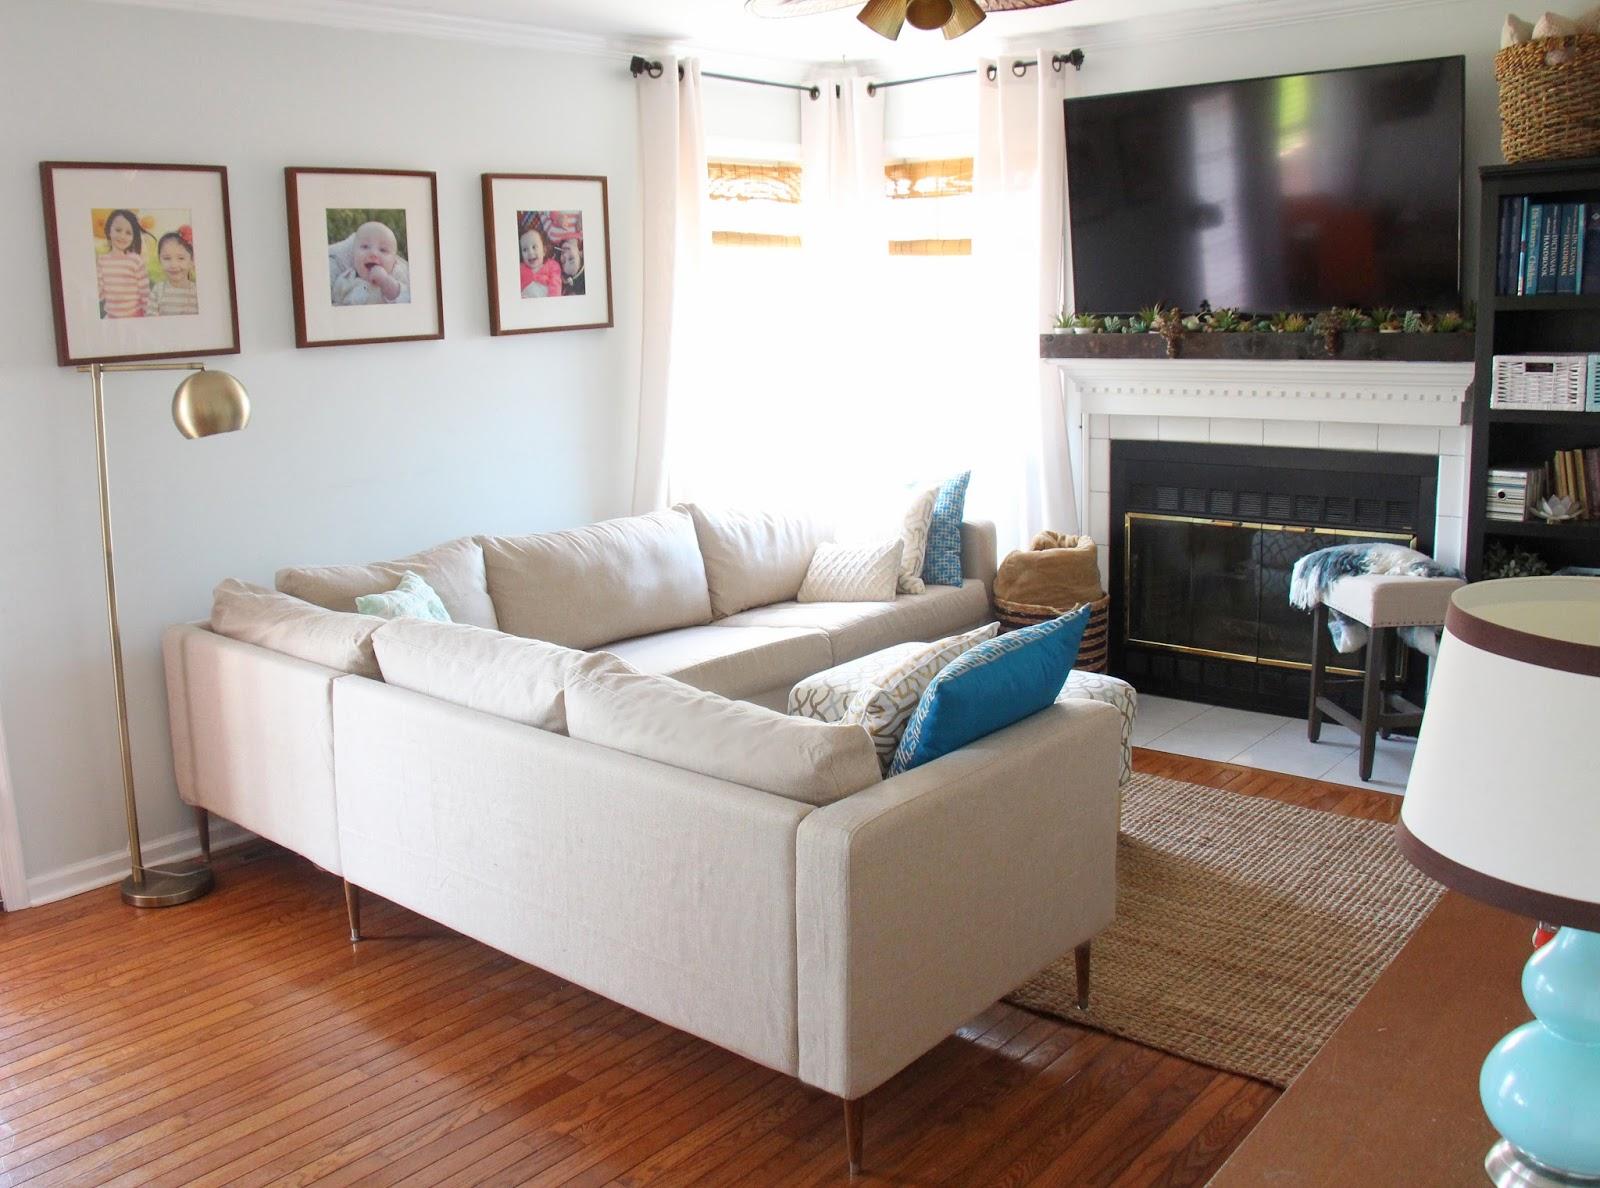 ekeskog sofa slipcover red and gold fabric grosgrain finally affordable ikea slipcovers